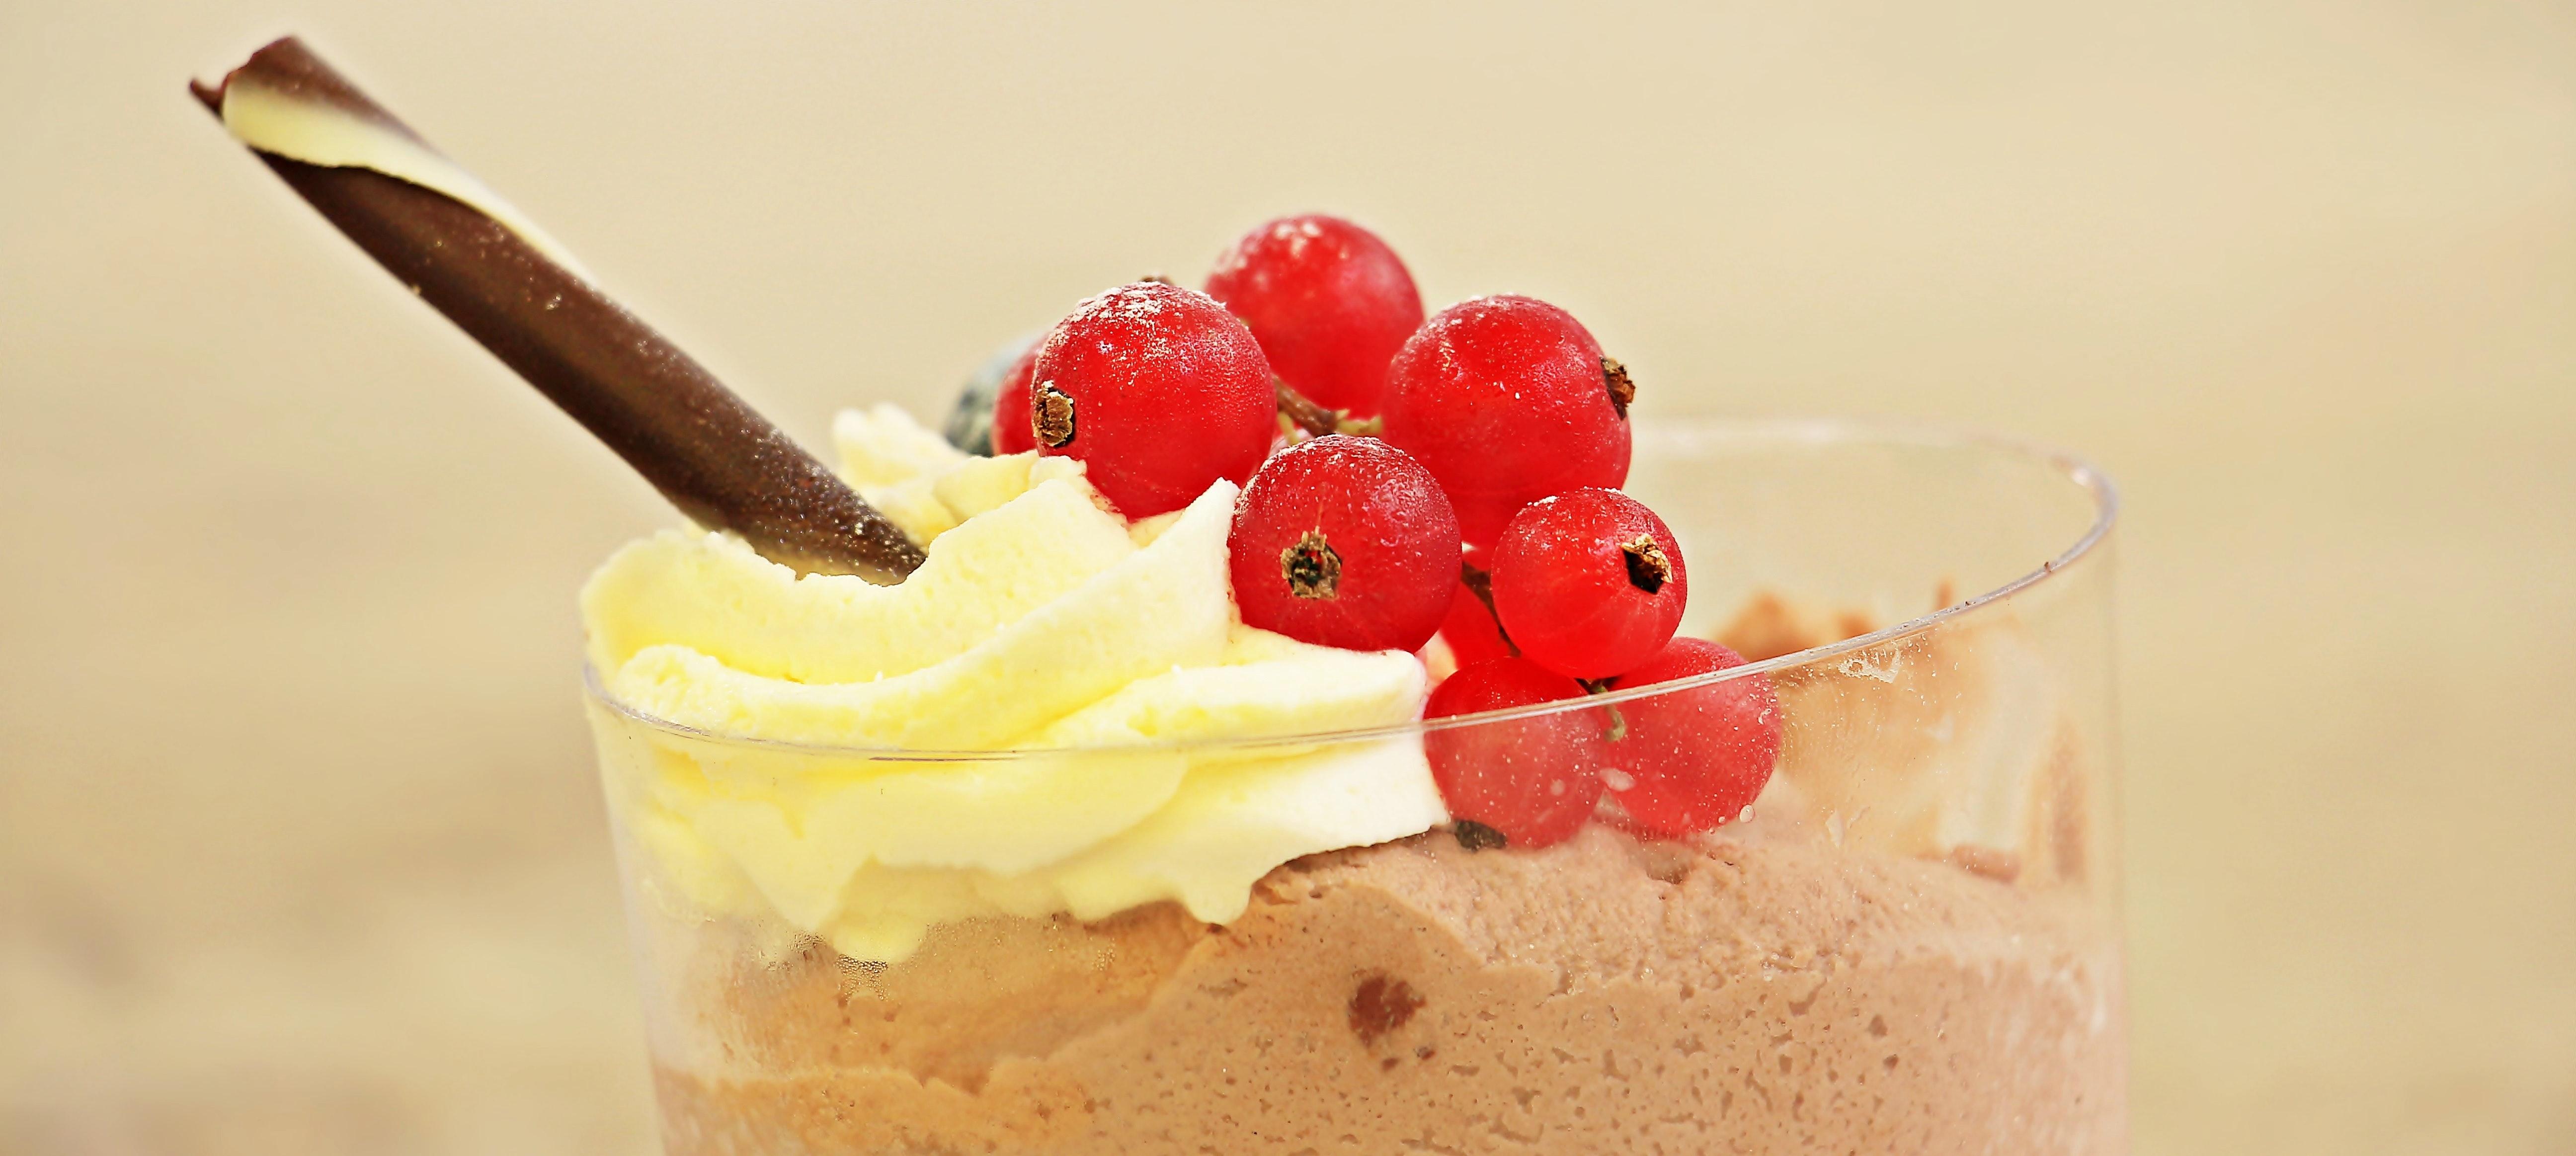 Beere Cremig Dessert